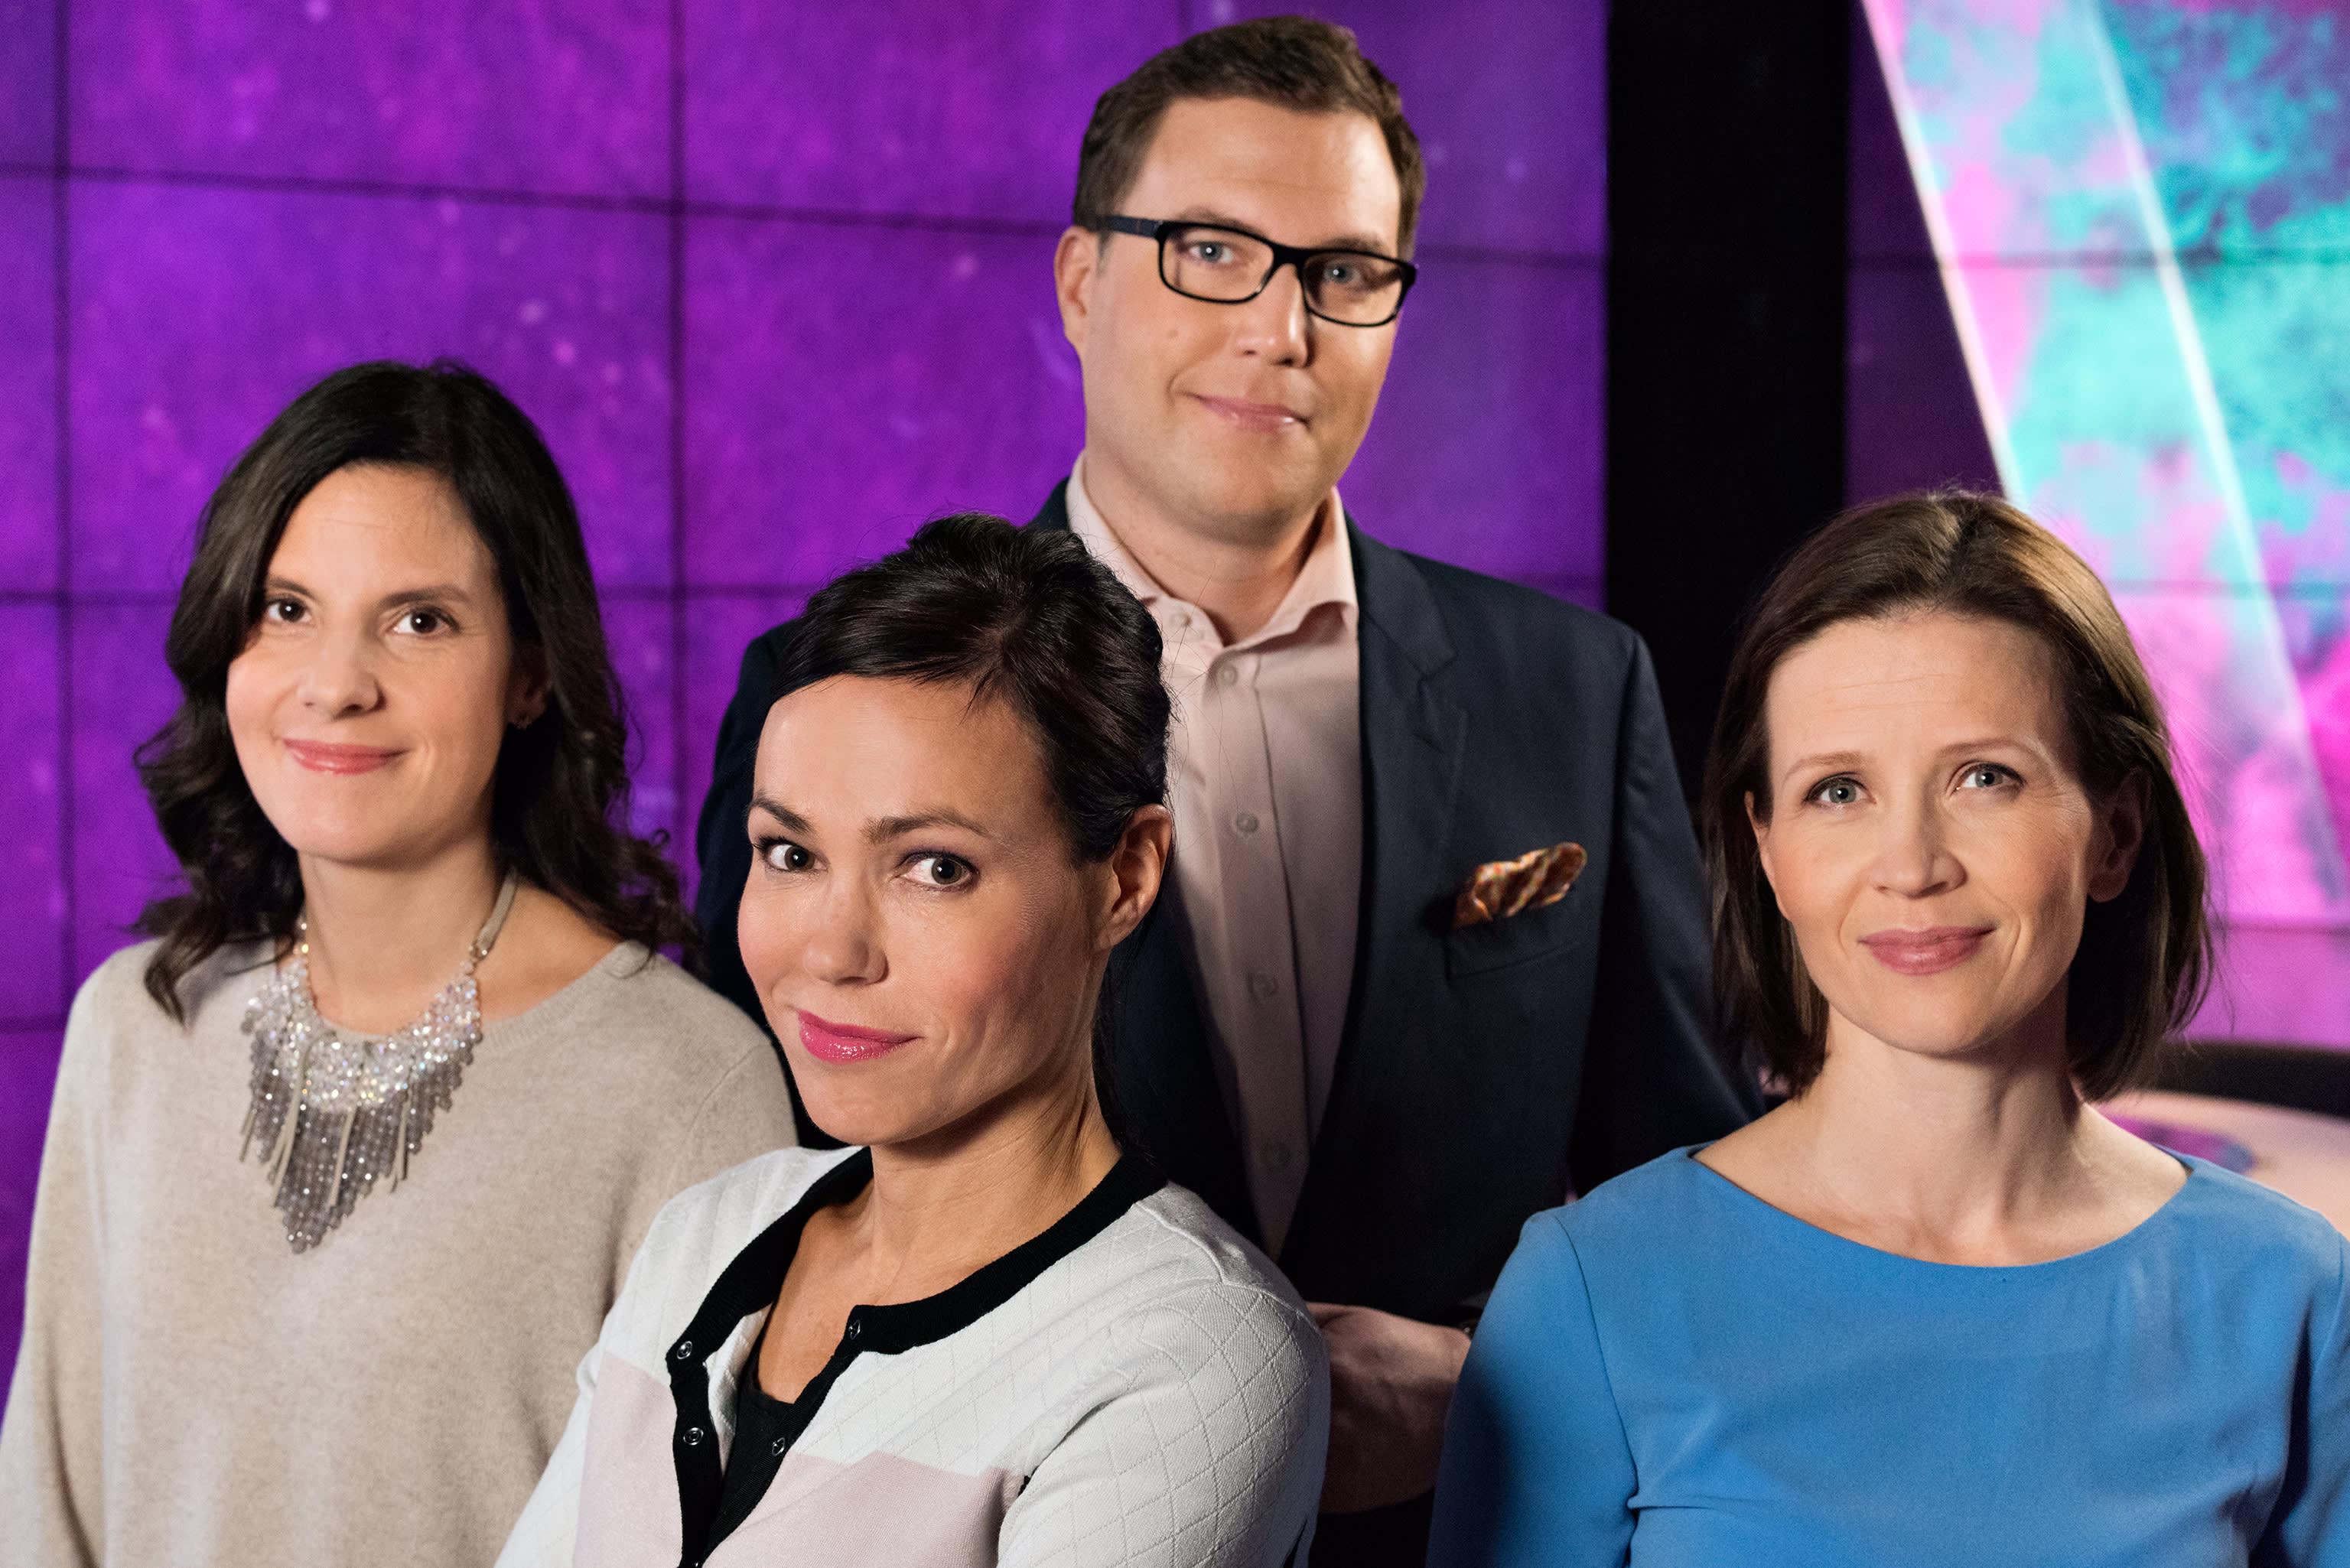 a-studio 2016, Kirsi Heikel, Jan Andersson, Johanna Vesikallio, Susanne Päivärinta